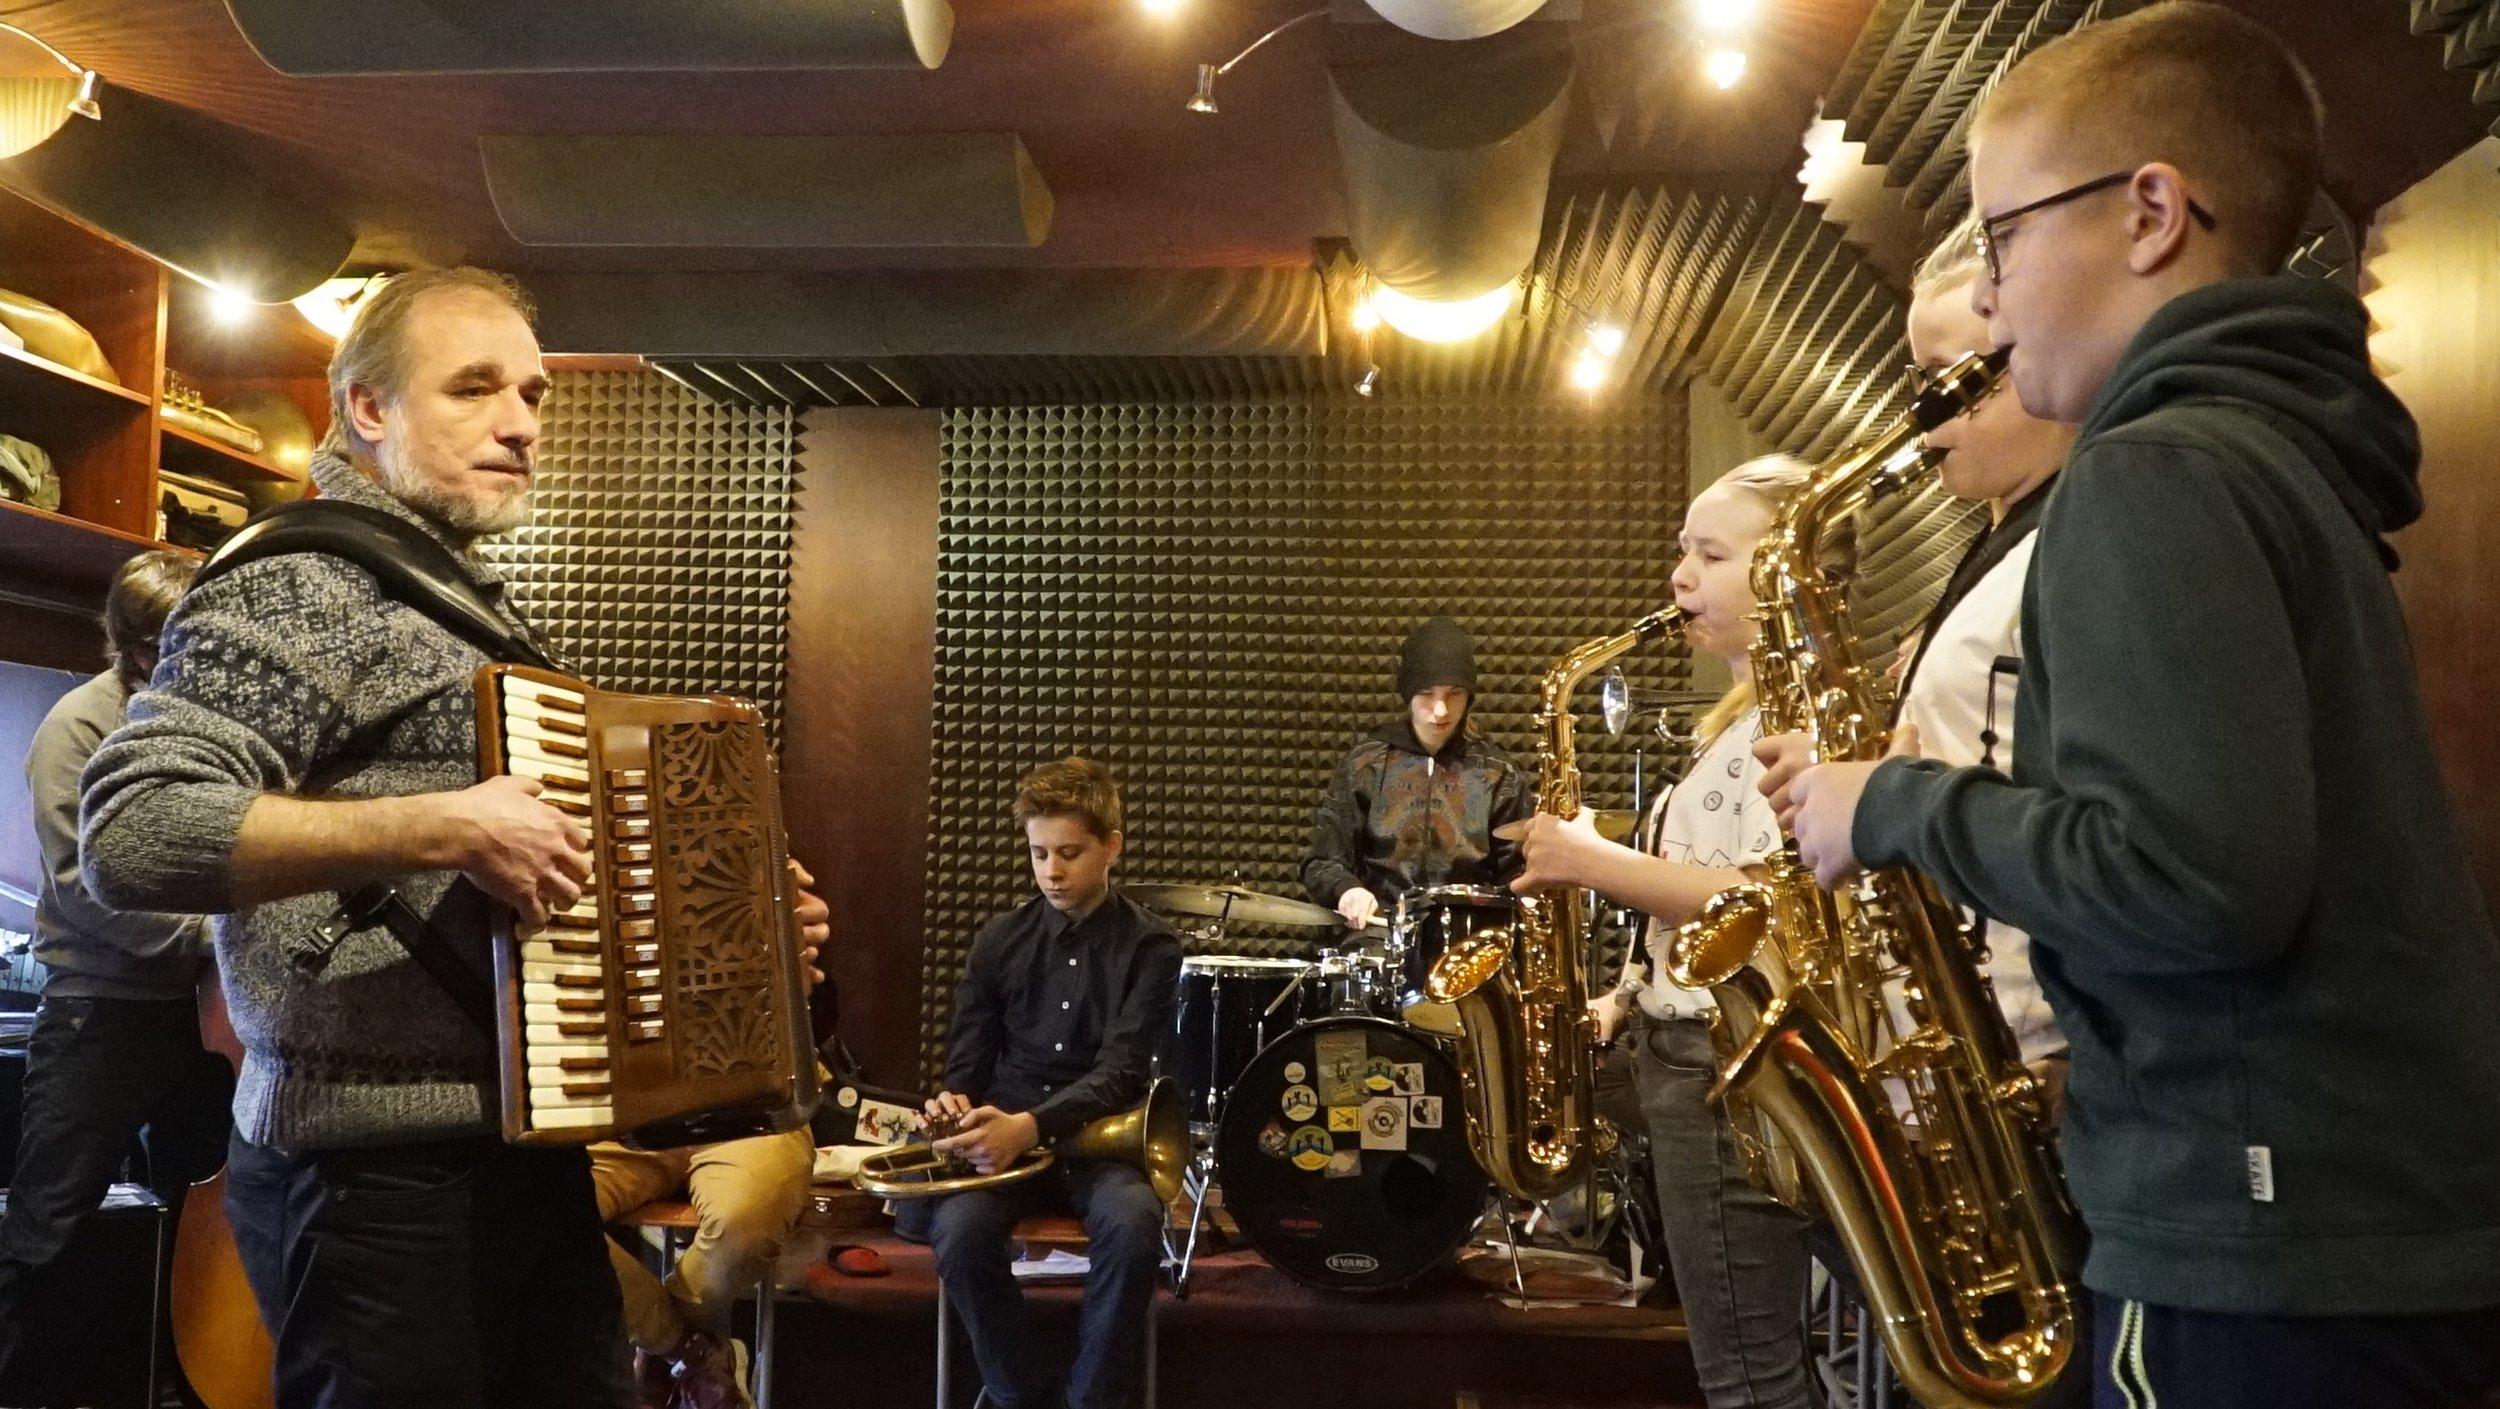 Klezmer Band rehearsals at the Borderland Foundation in March 2018.Photo by Jarosław Wszędybył.